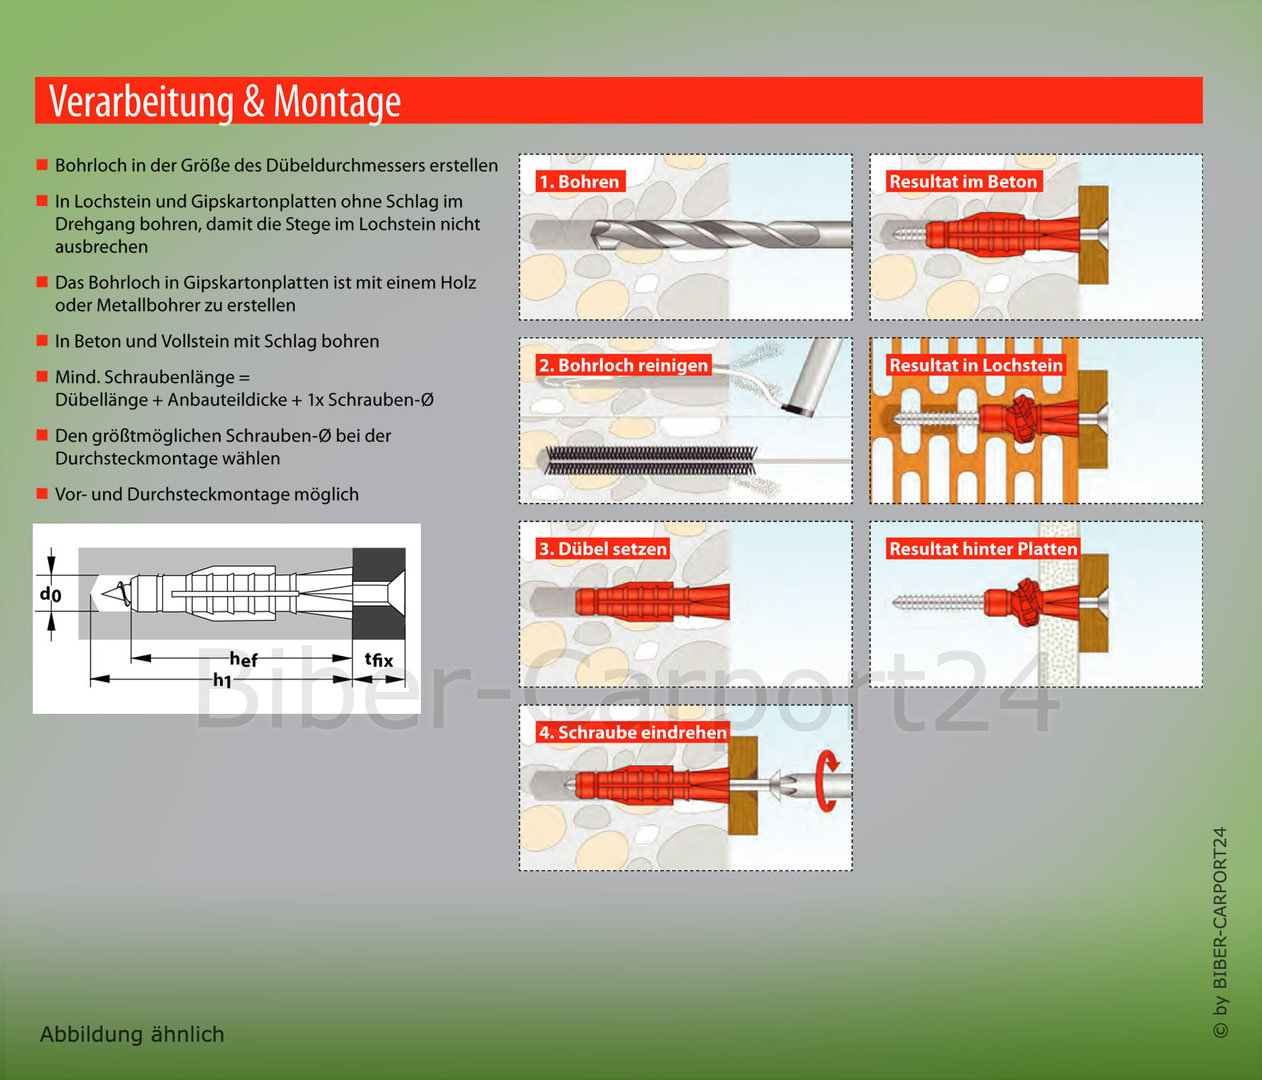 Tox Tri Allzweckdubel Verschiedene Grossen Made In Germany